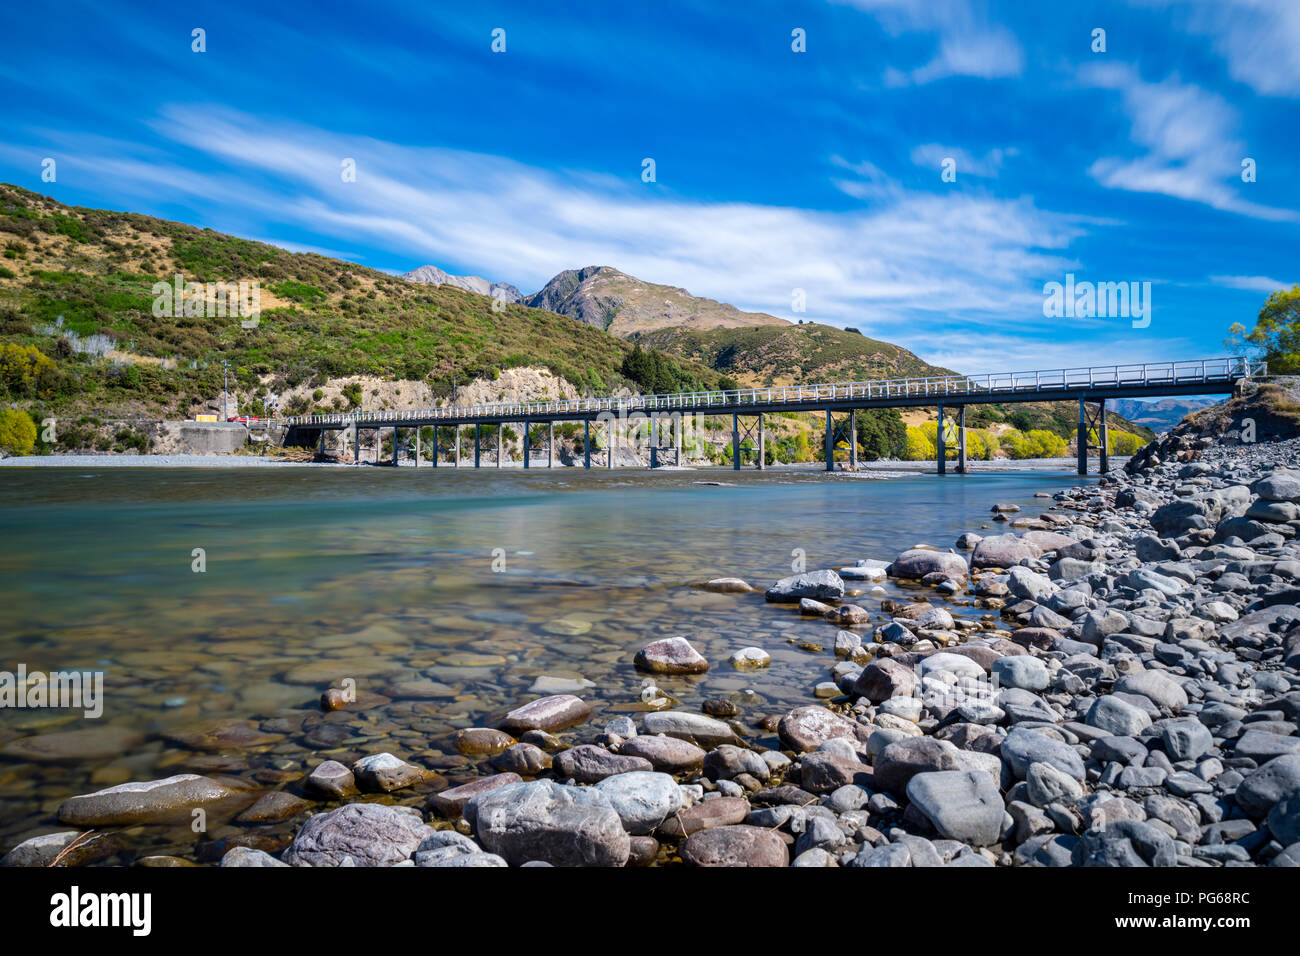 New Zealand, South Island, Canterbury Region, Arthur's Pass National Park, Waimakairi River, Mt. White Bridge - Stock Image